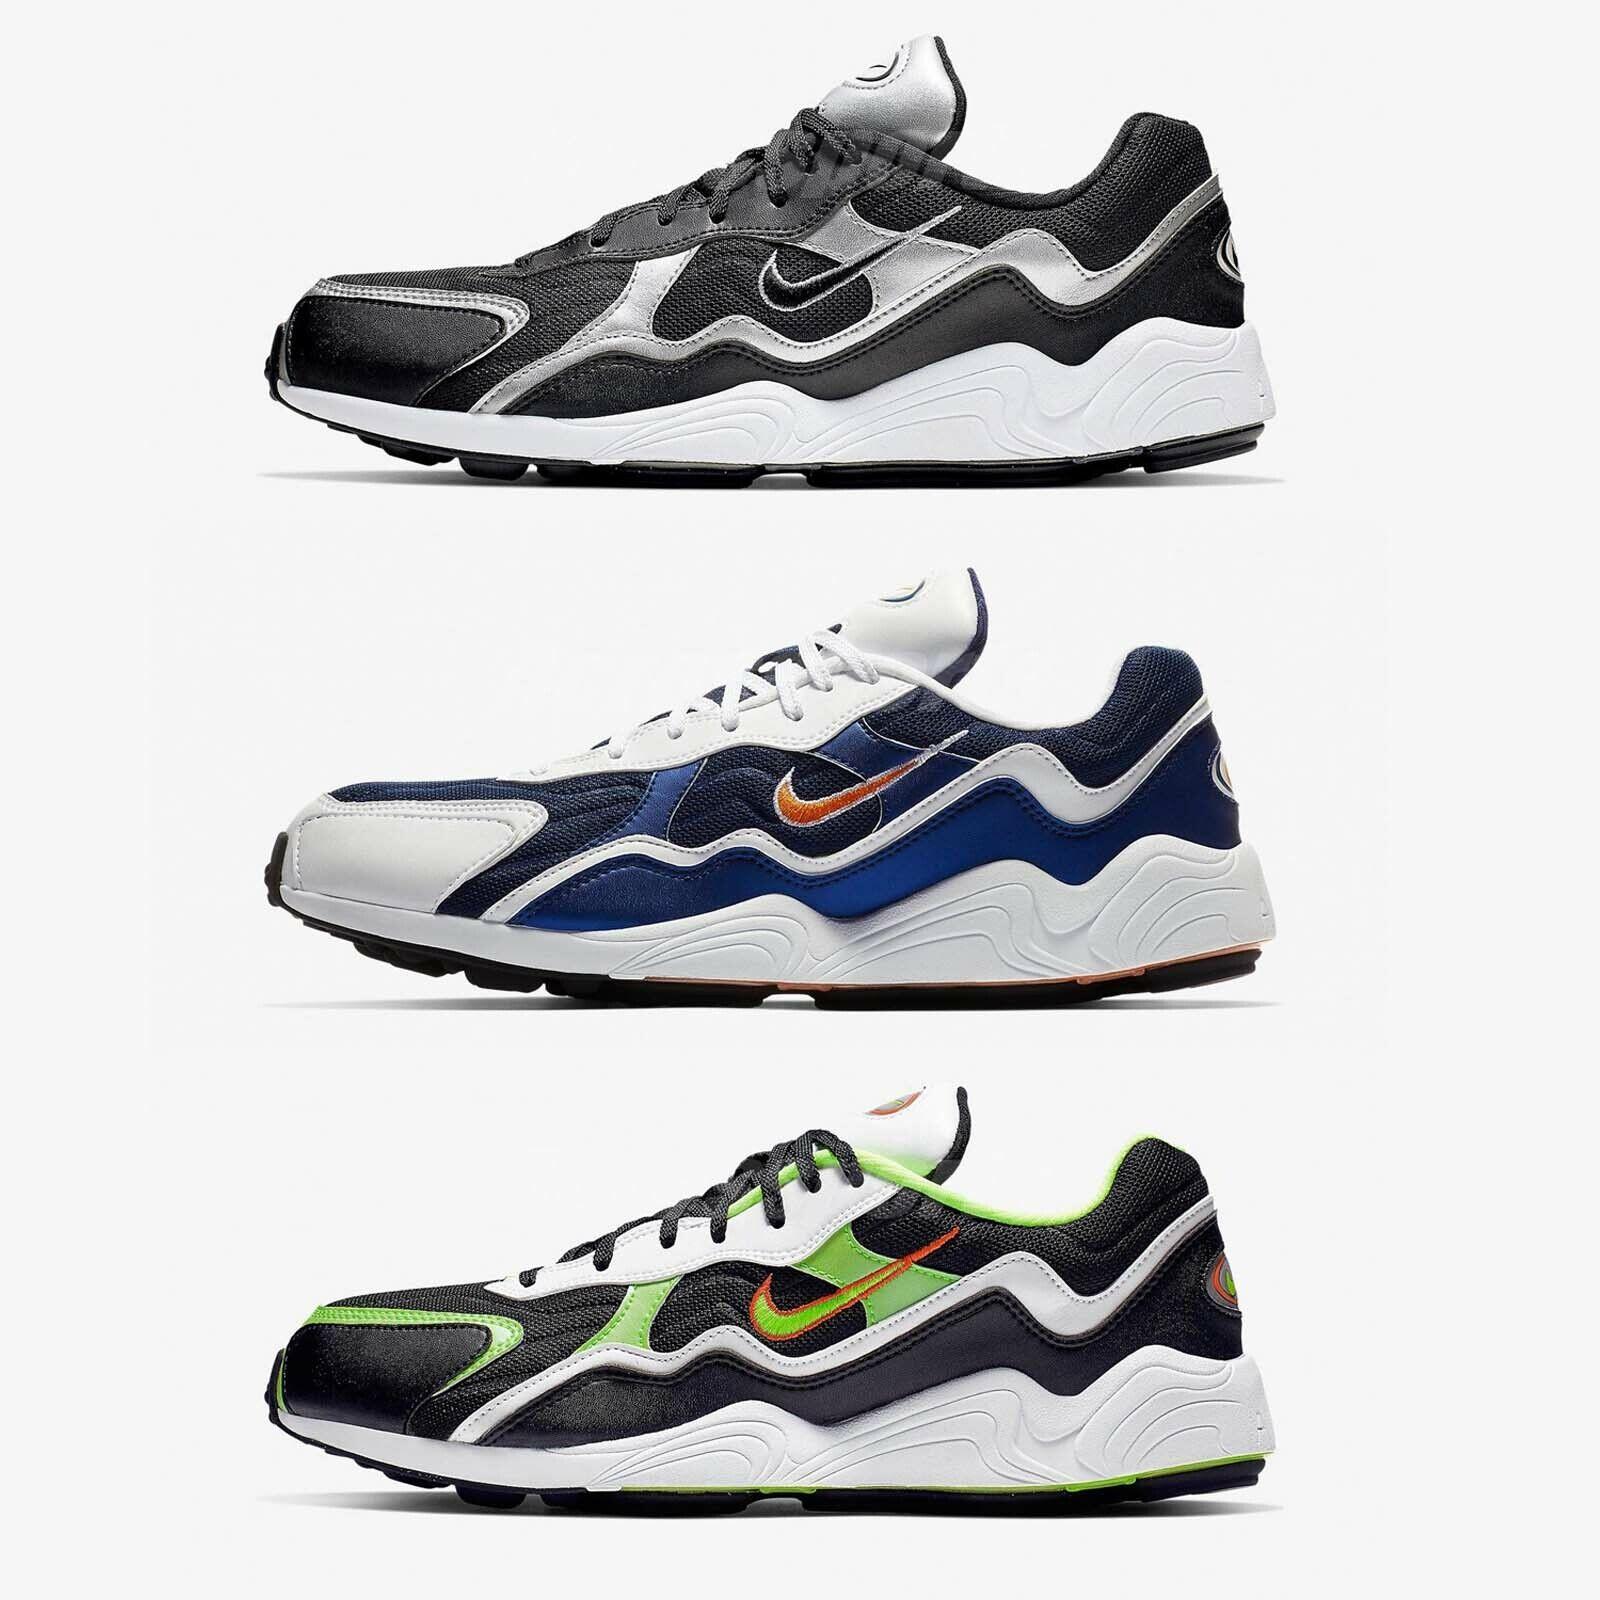 Nike Air Zoom Alpha schwarz Silber 90er Retro Style Men Running schuhe Pick 1